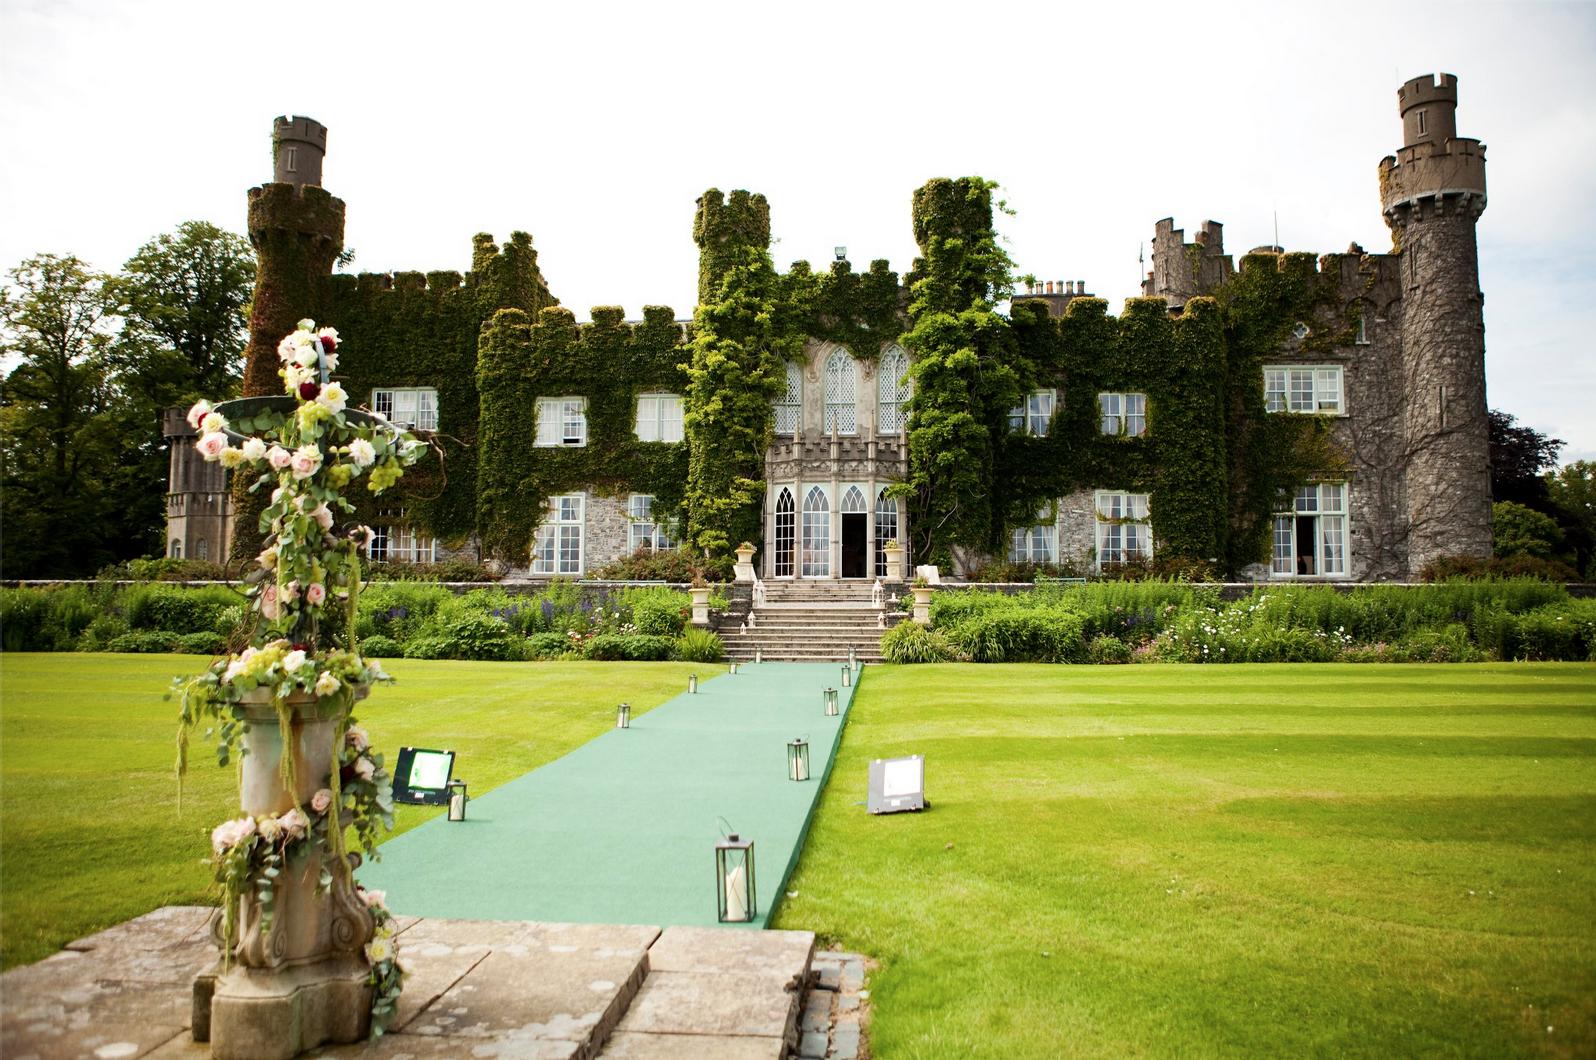 Microsite Weddings Wedding venues scotland, Castles in